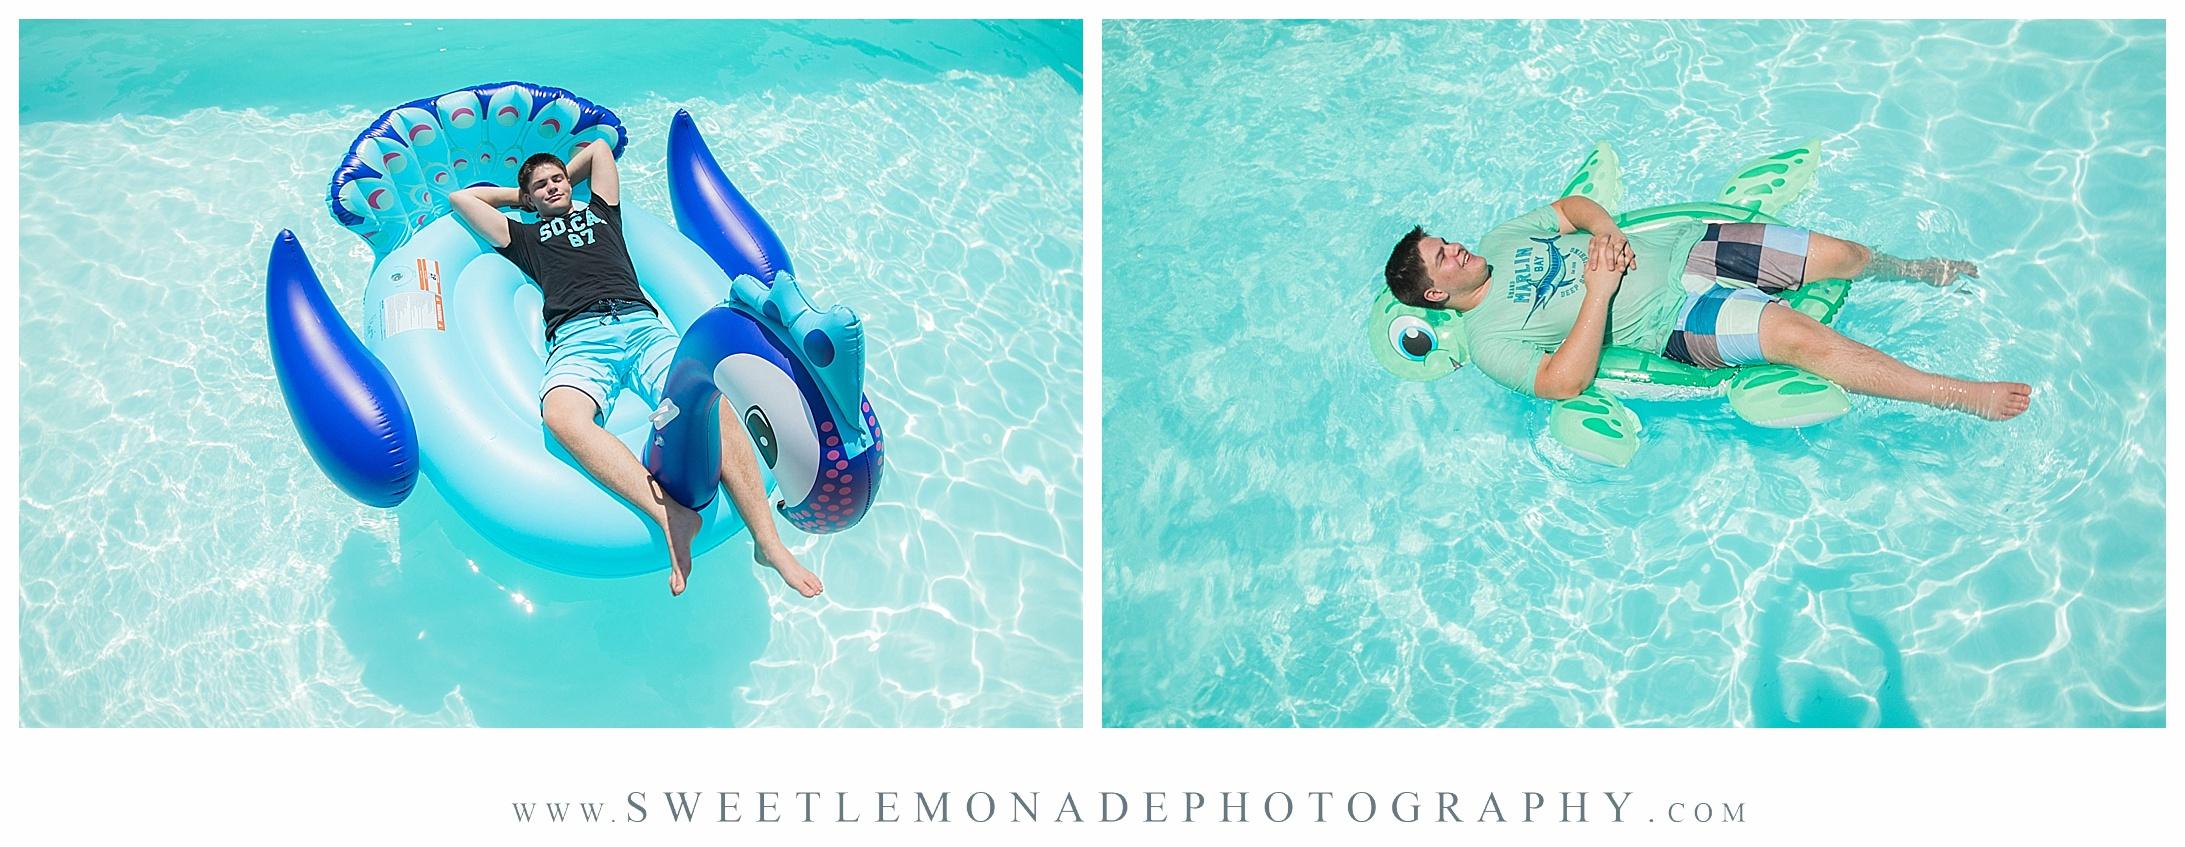 champaign-senior-photographer-sweet-lemonade-photography-senior-pictures-pool_2148.jpg